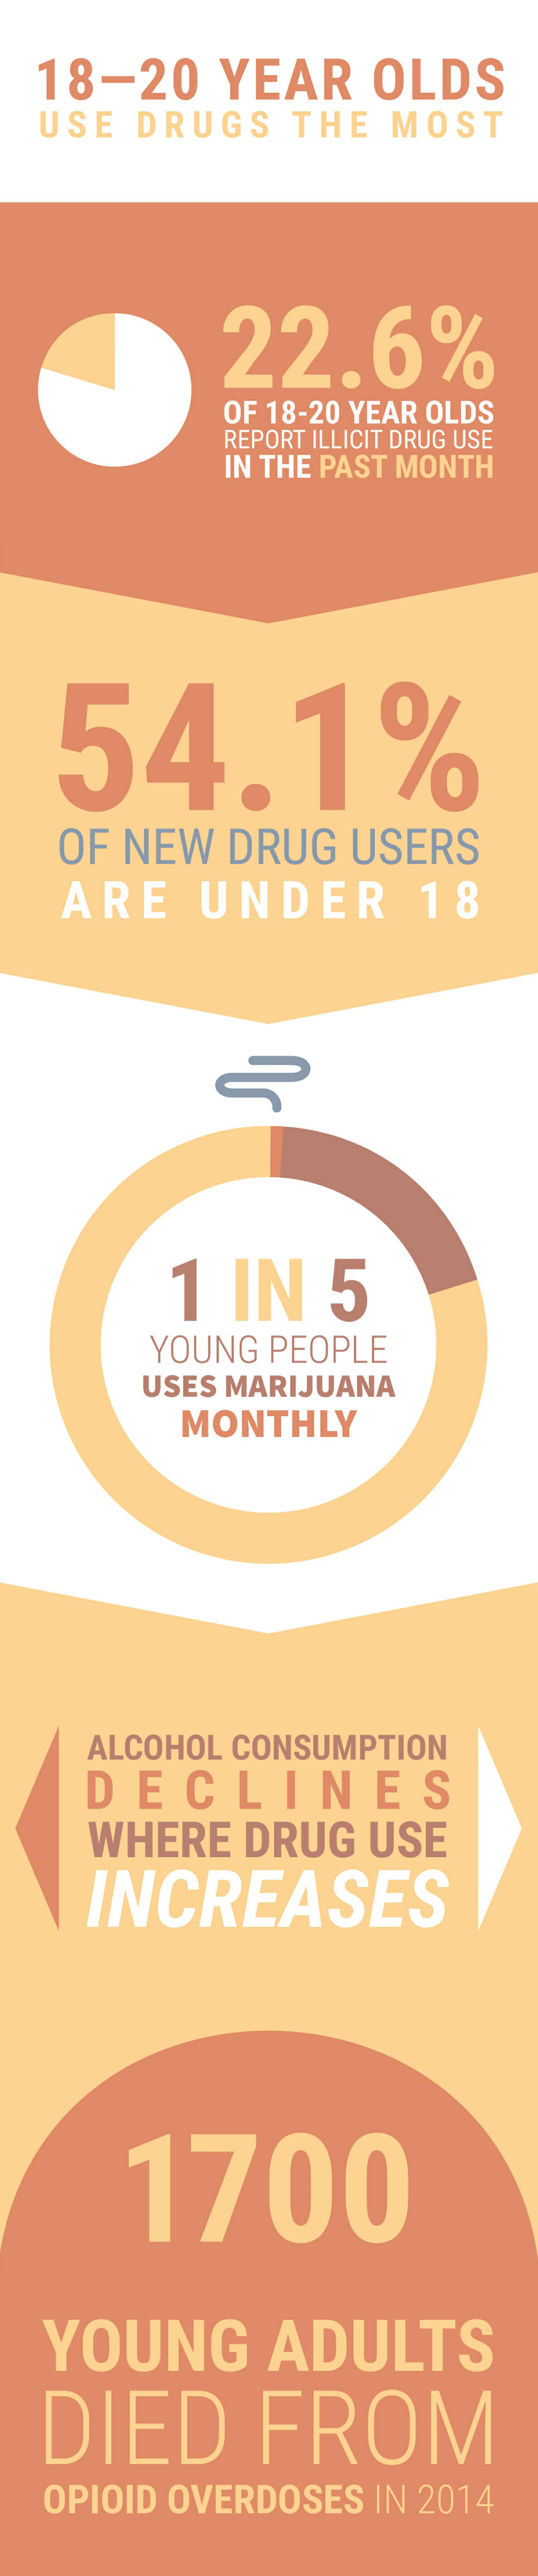 drug addiction statistics - 18 to 20 year olds